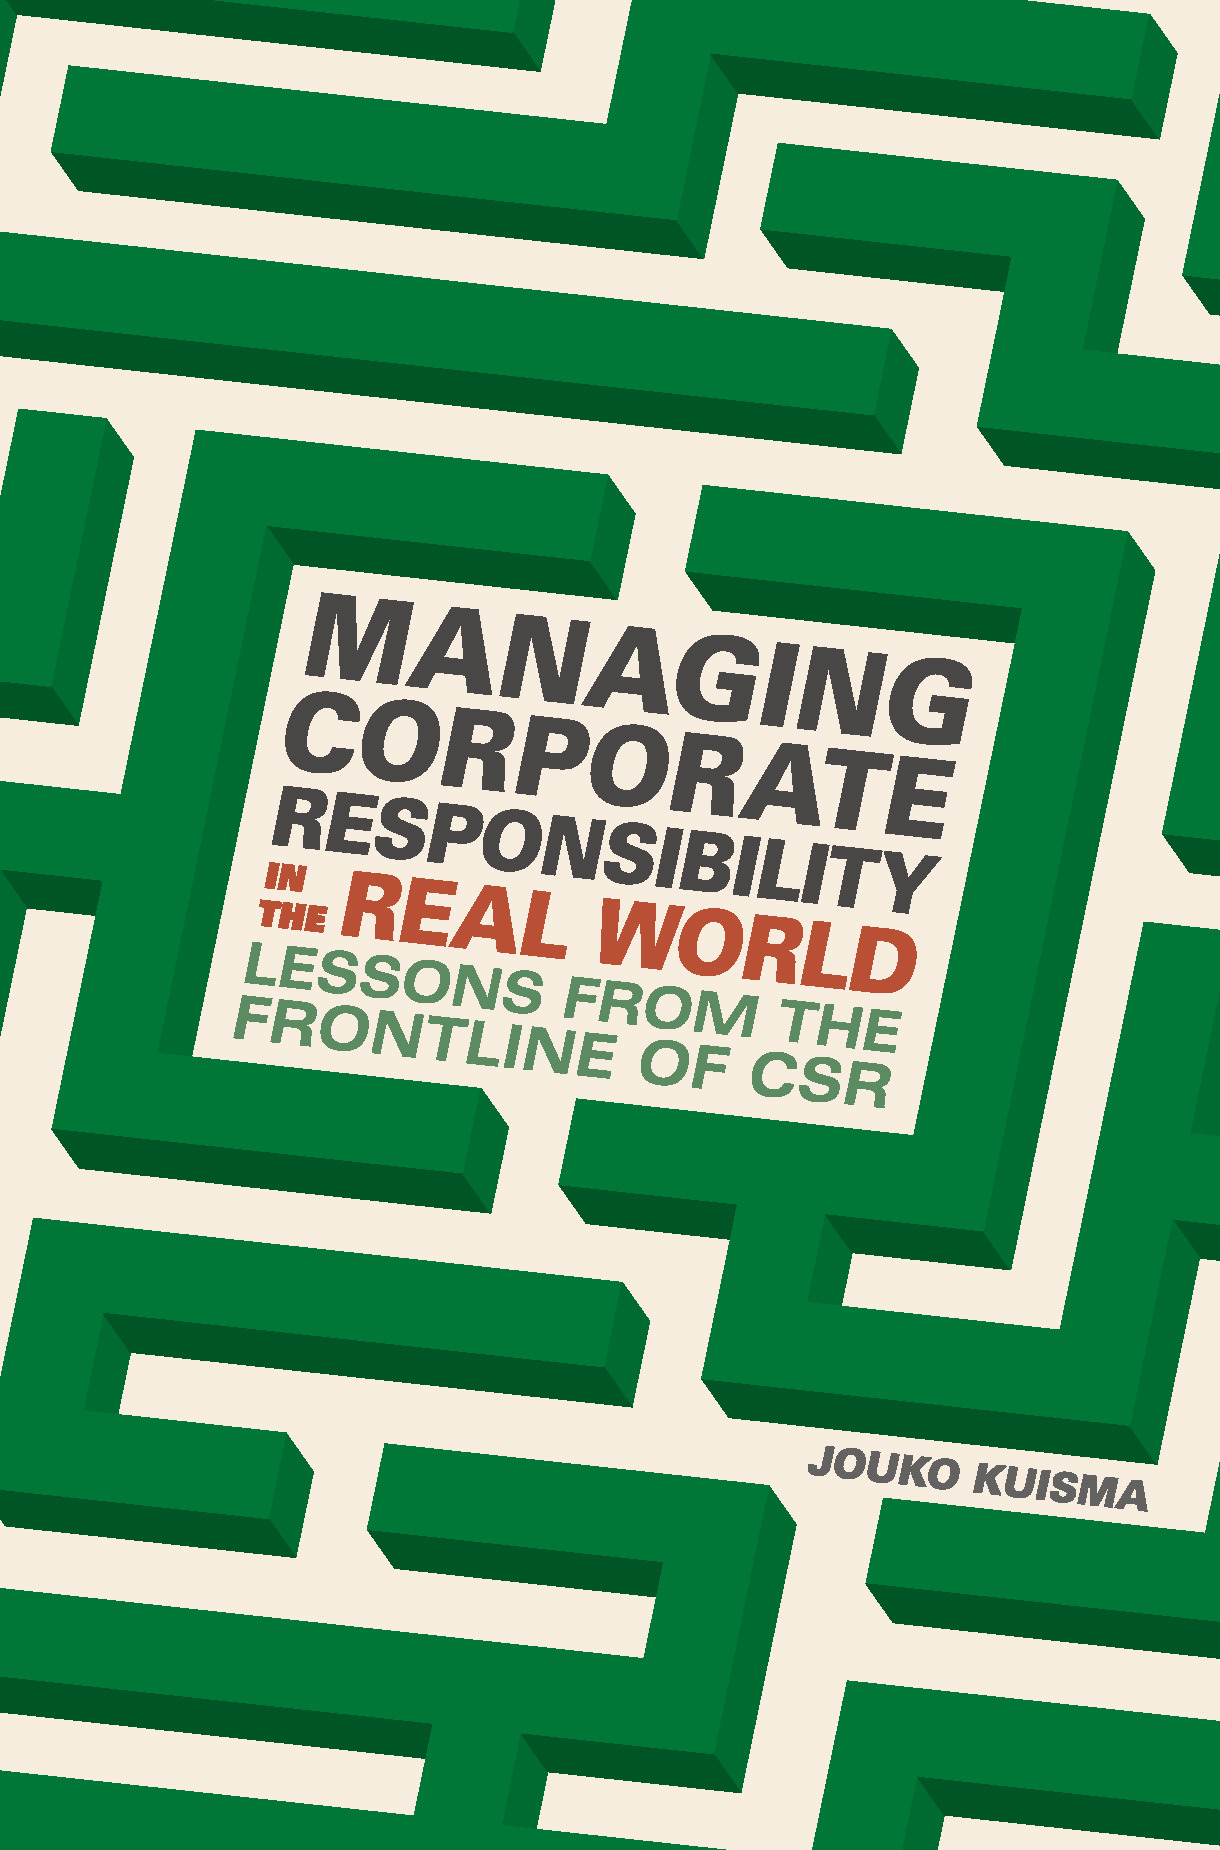 Kuisma, Jouko - Managing Corporate Responsibility in the Real World, ebook